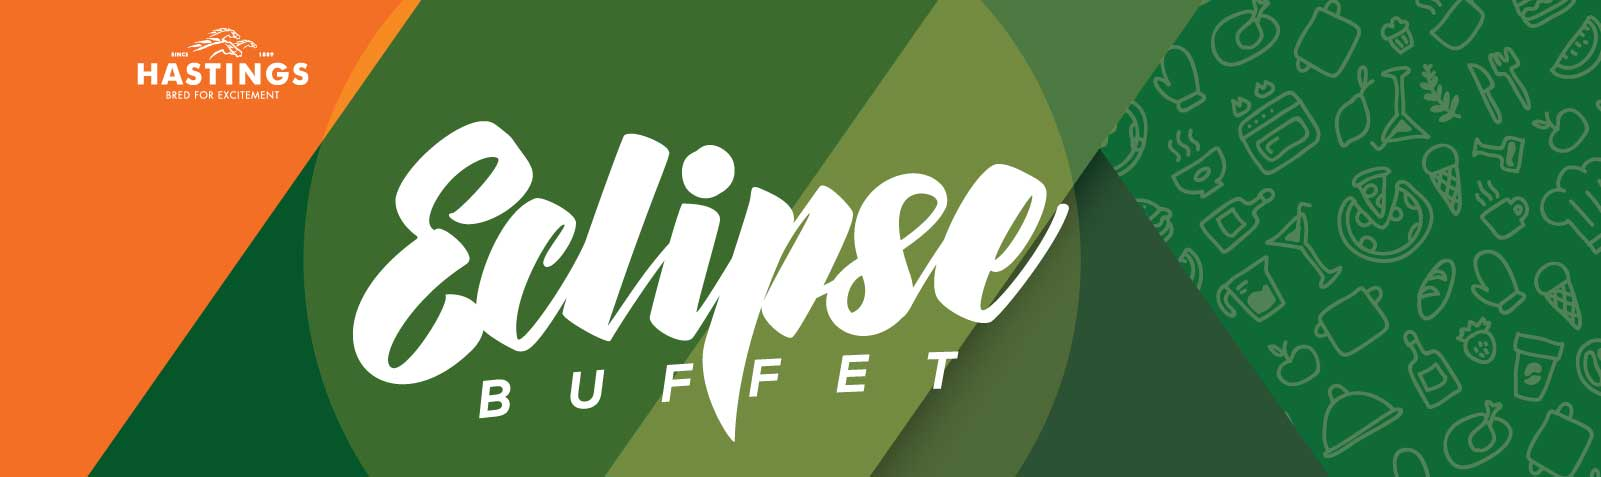 FB17-127-Eclipse-Buffet-April-Slider